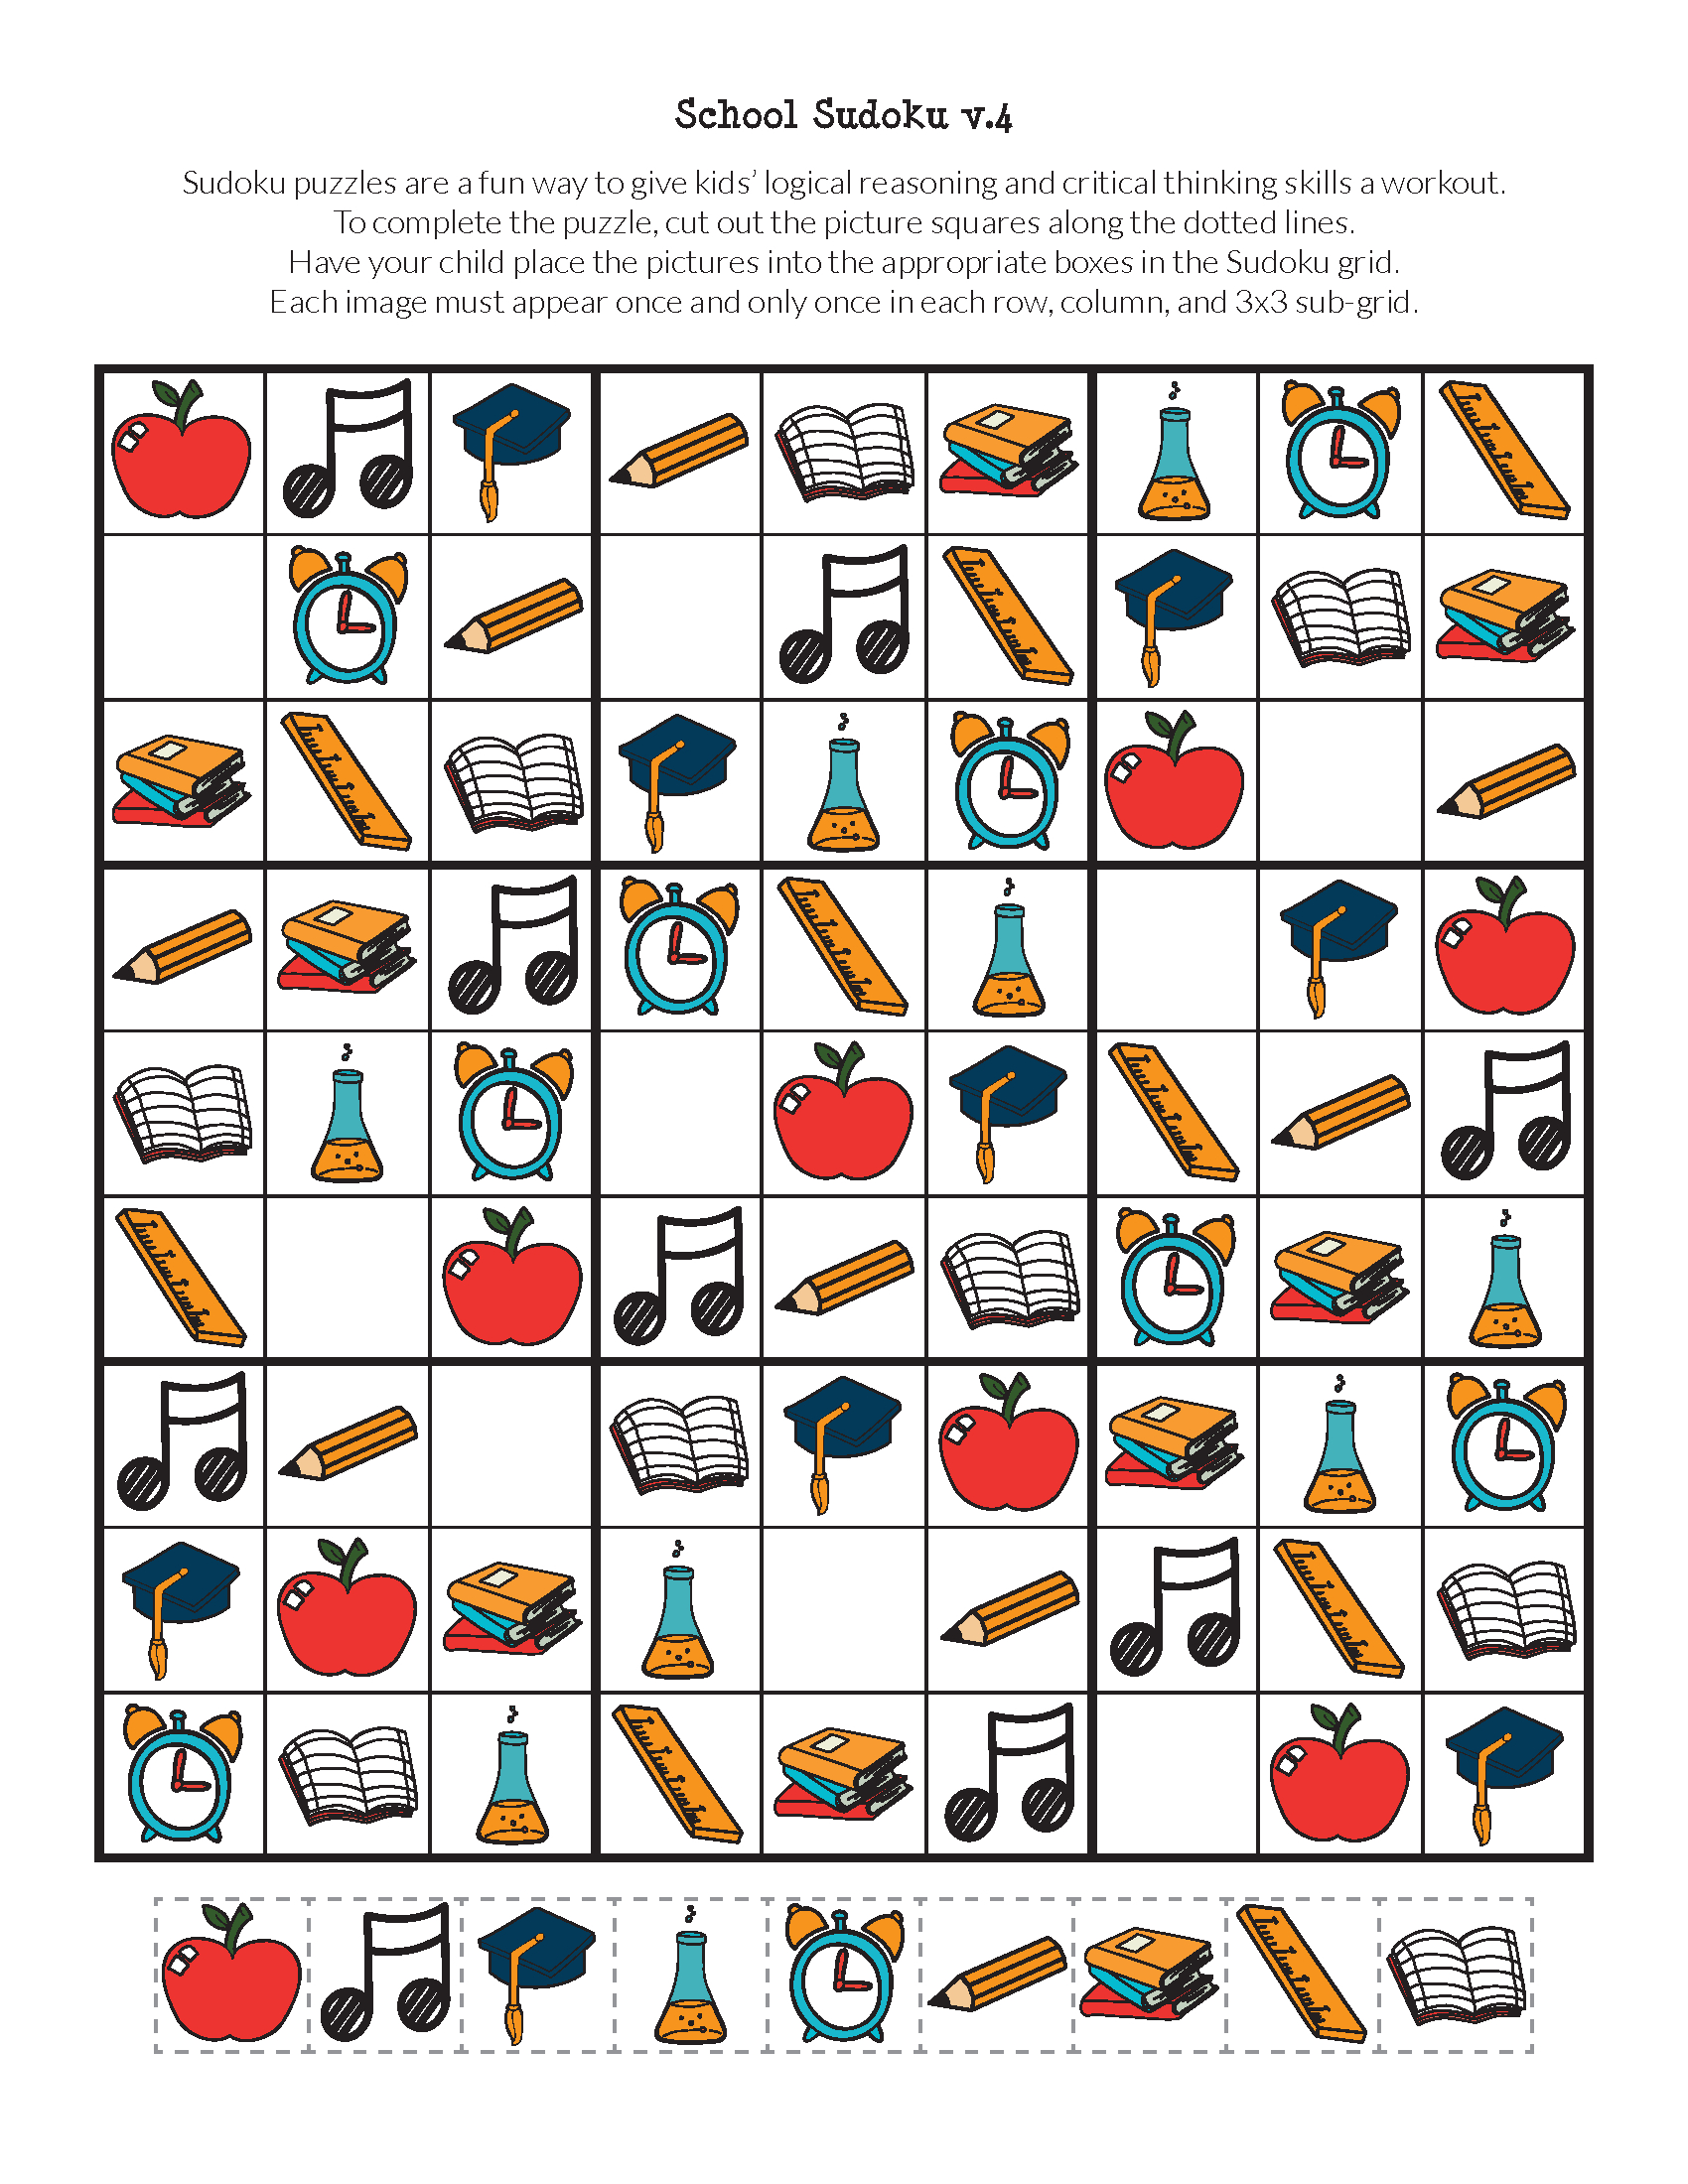 School Sudoku Puzzles {Free Printables} | Sudoku | Sudoku Puzzles - Free Printable Critical Thinking Puzzles